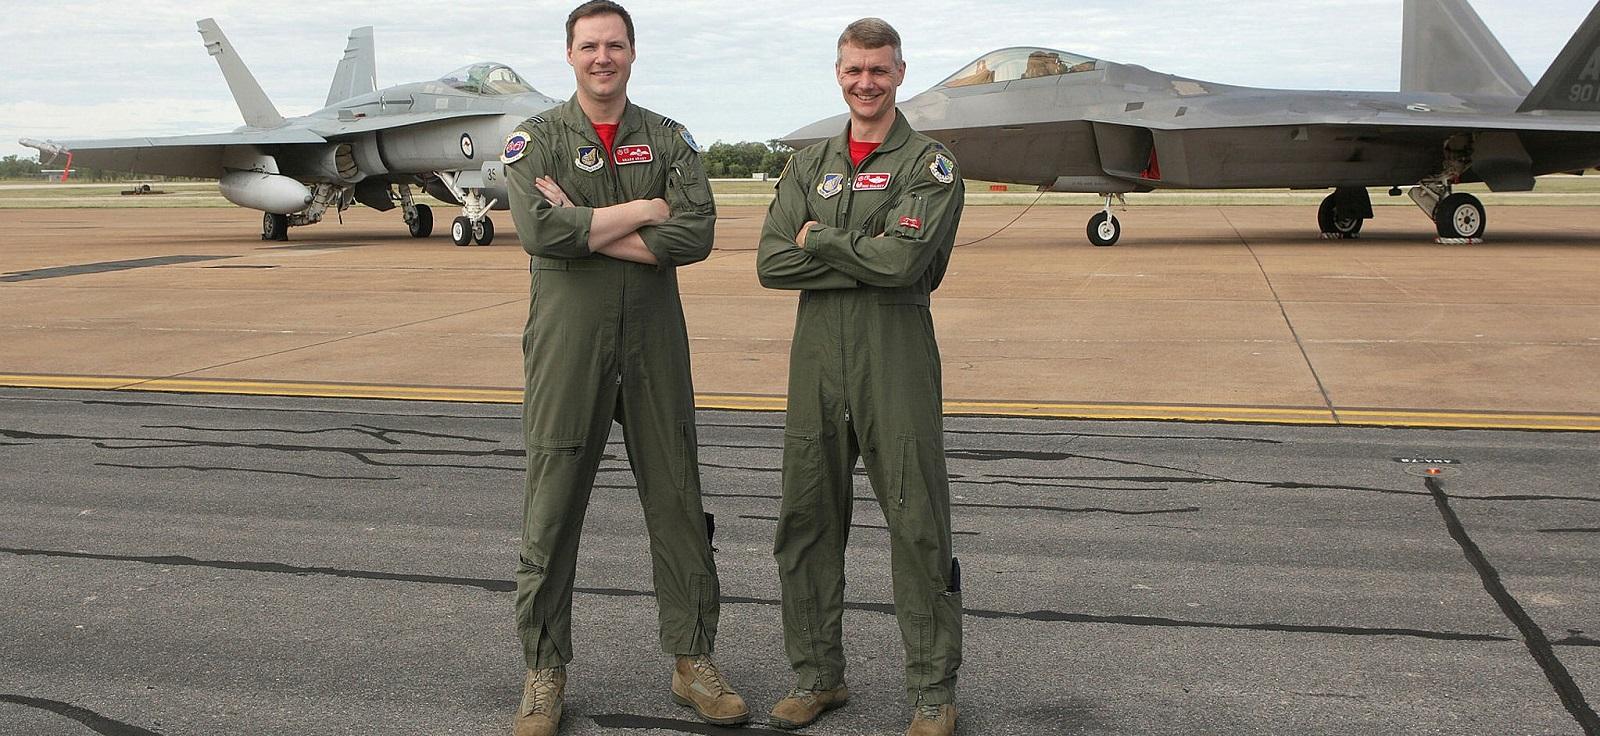 Ft Lt William Grady, 90th Fighter Squadron USAF (left) and USAF Lt Cnl David Skalicky  (Photo: Aust Defence Image Library)